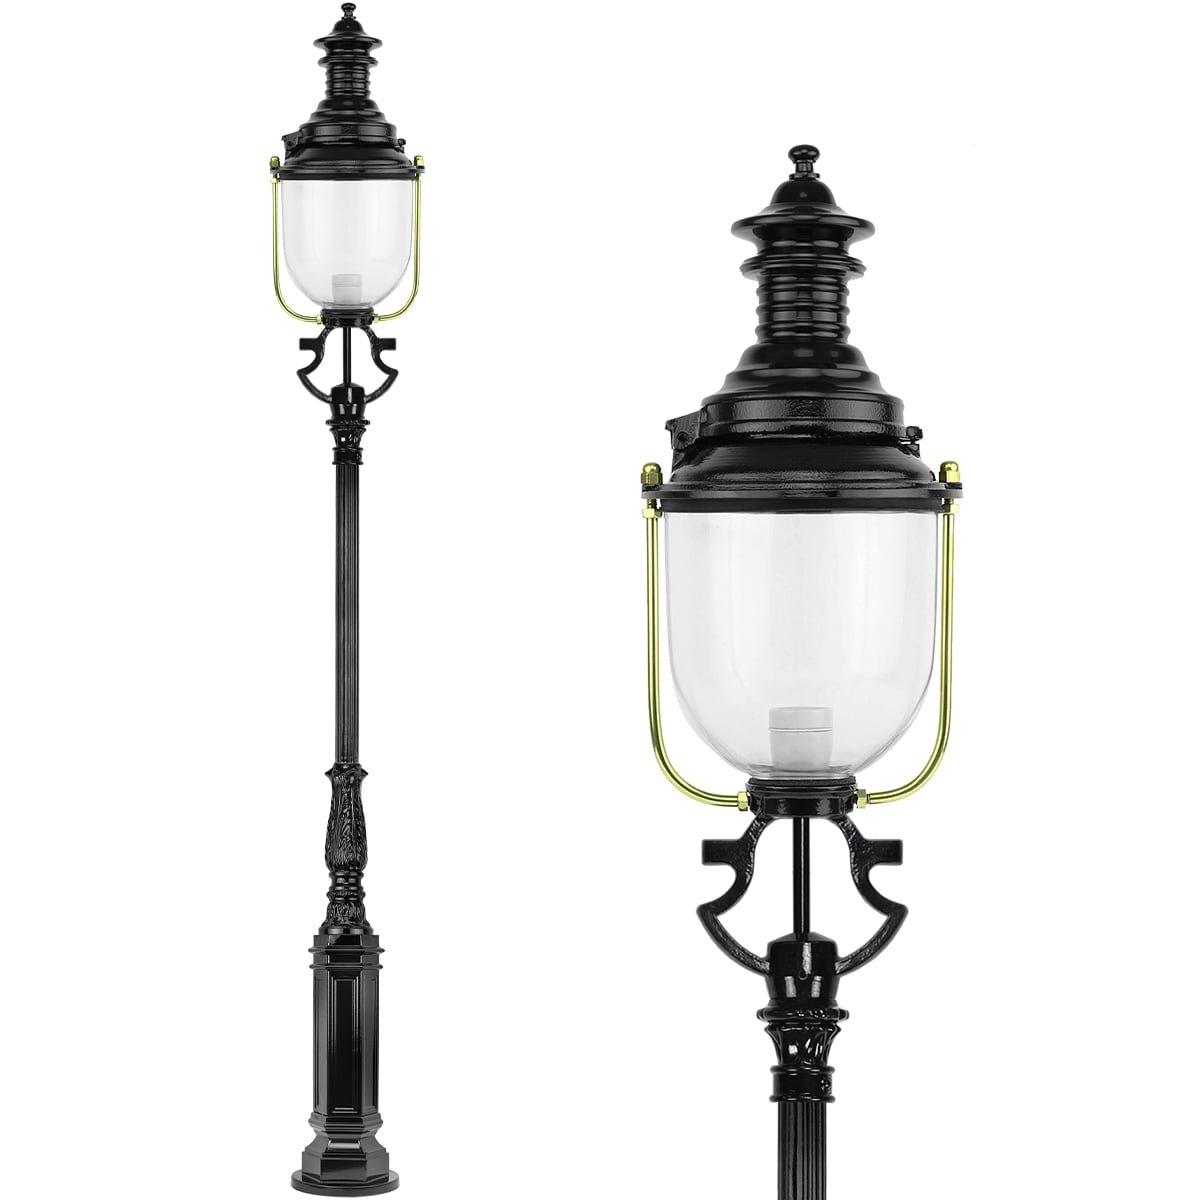 Outdoor Lighting Classic Rural Lantern post Old English Durgerdam - 295 cm